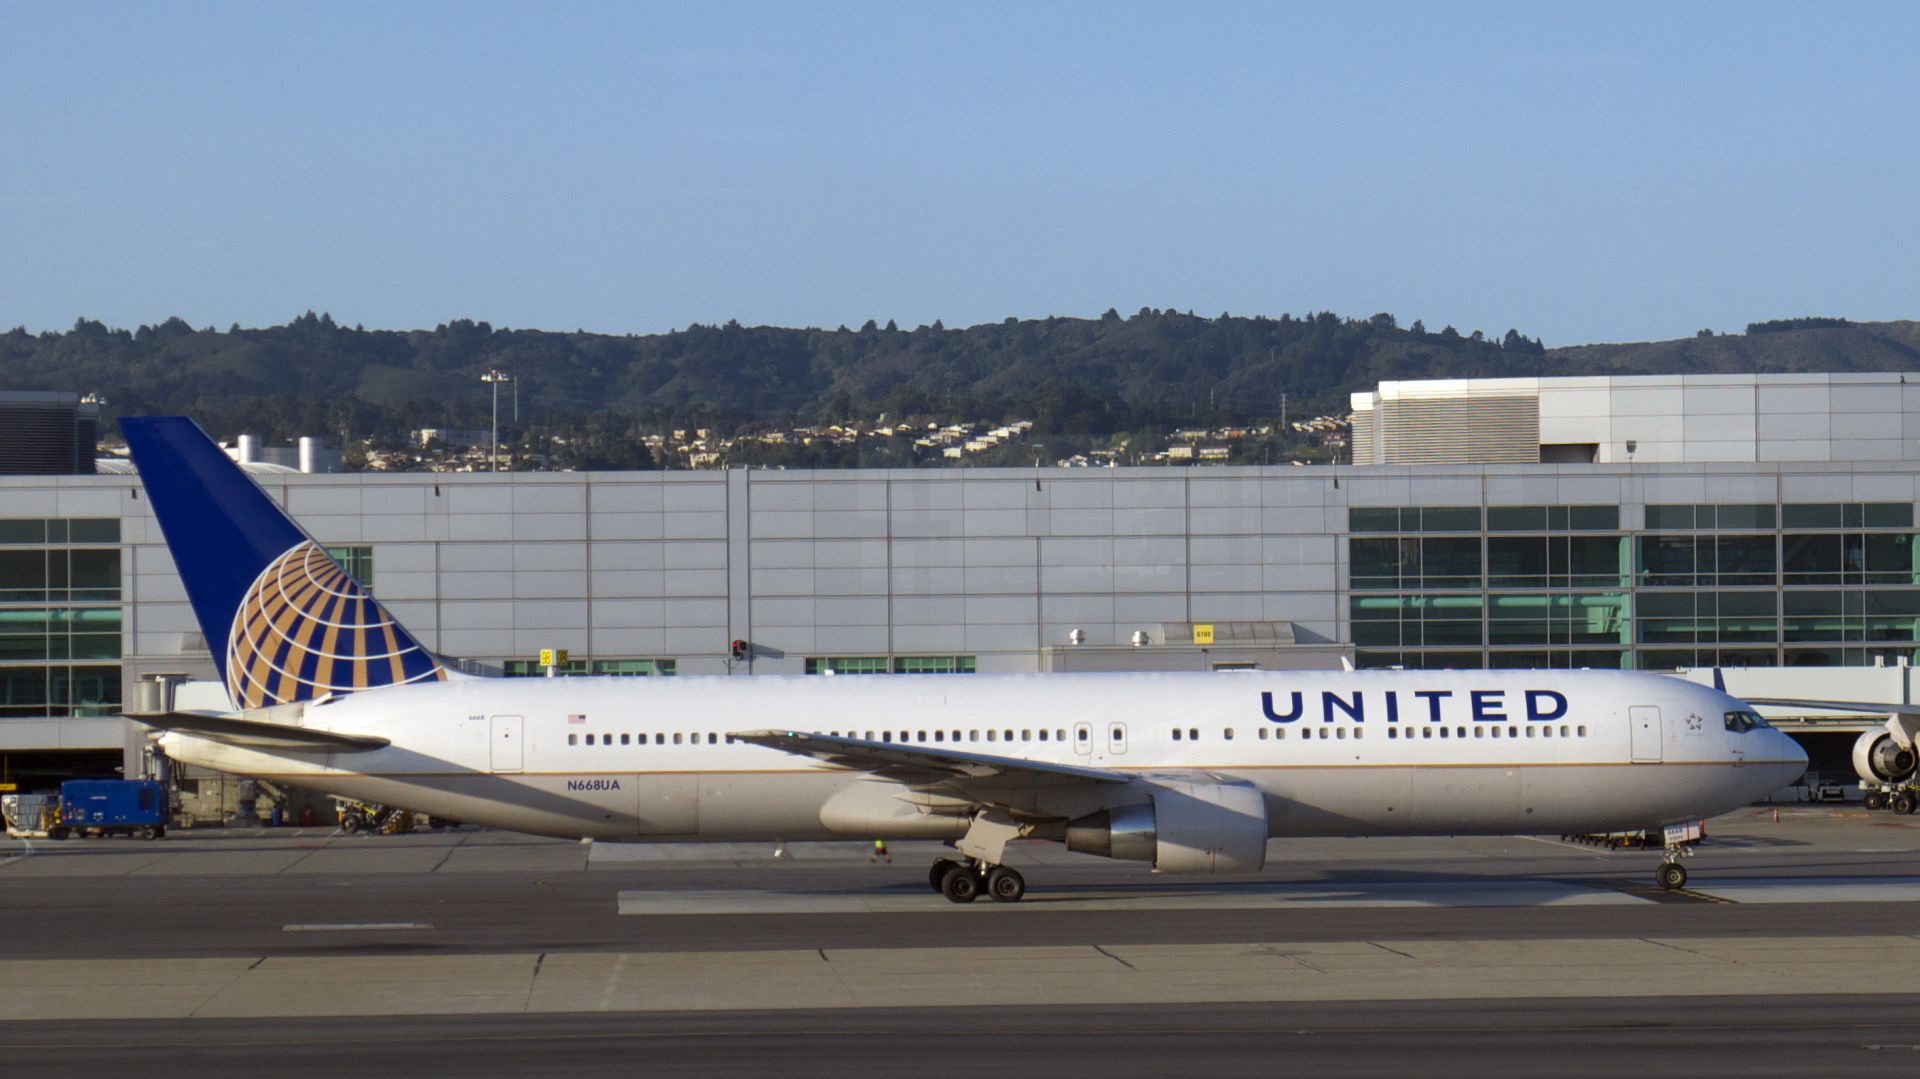 Boeing 767-300 společnosti United Airlines. Autor: United Airlines